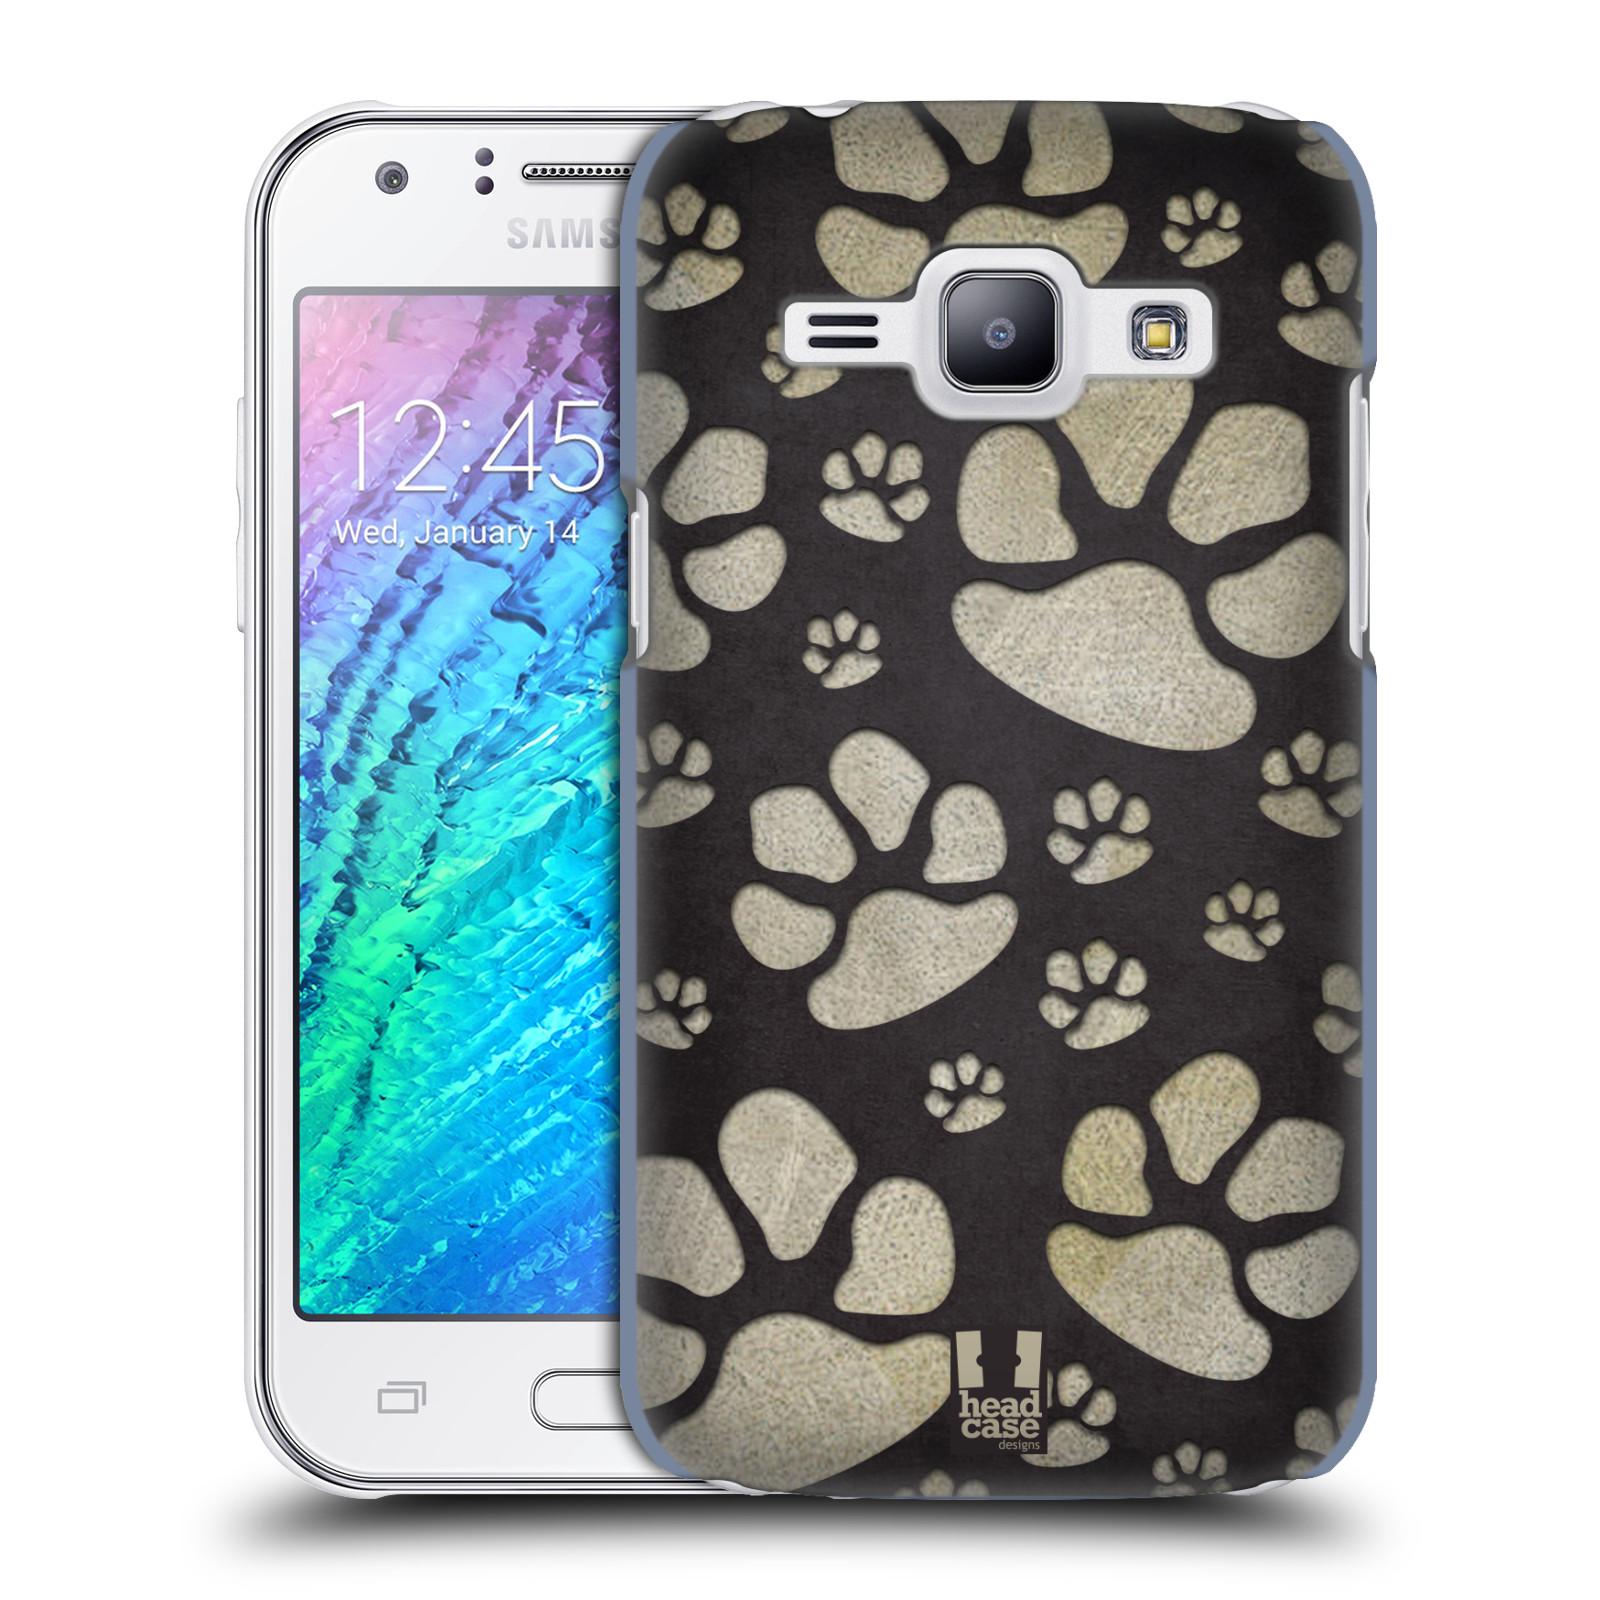 Plastové pouzdro na mobil Samsung Galaxy J1 HEAD CASE TLAPKY ŠEDÉ (Kryt či obal na mobilní telefon Samsung Galaxy J1 a J1 Duos )